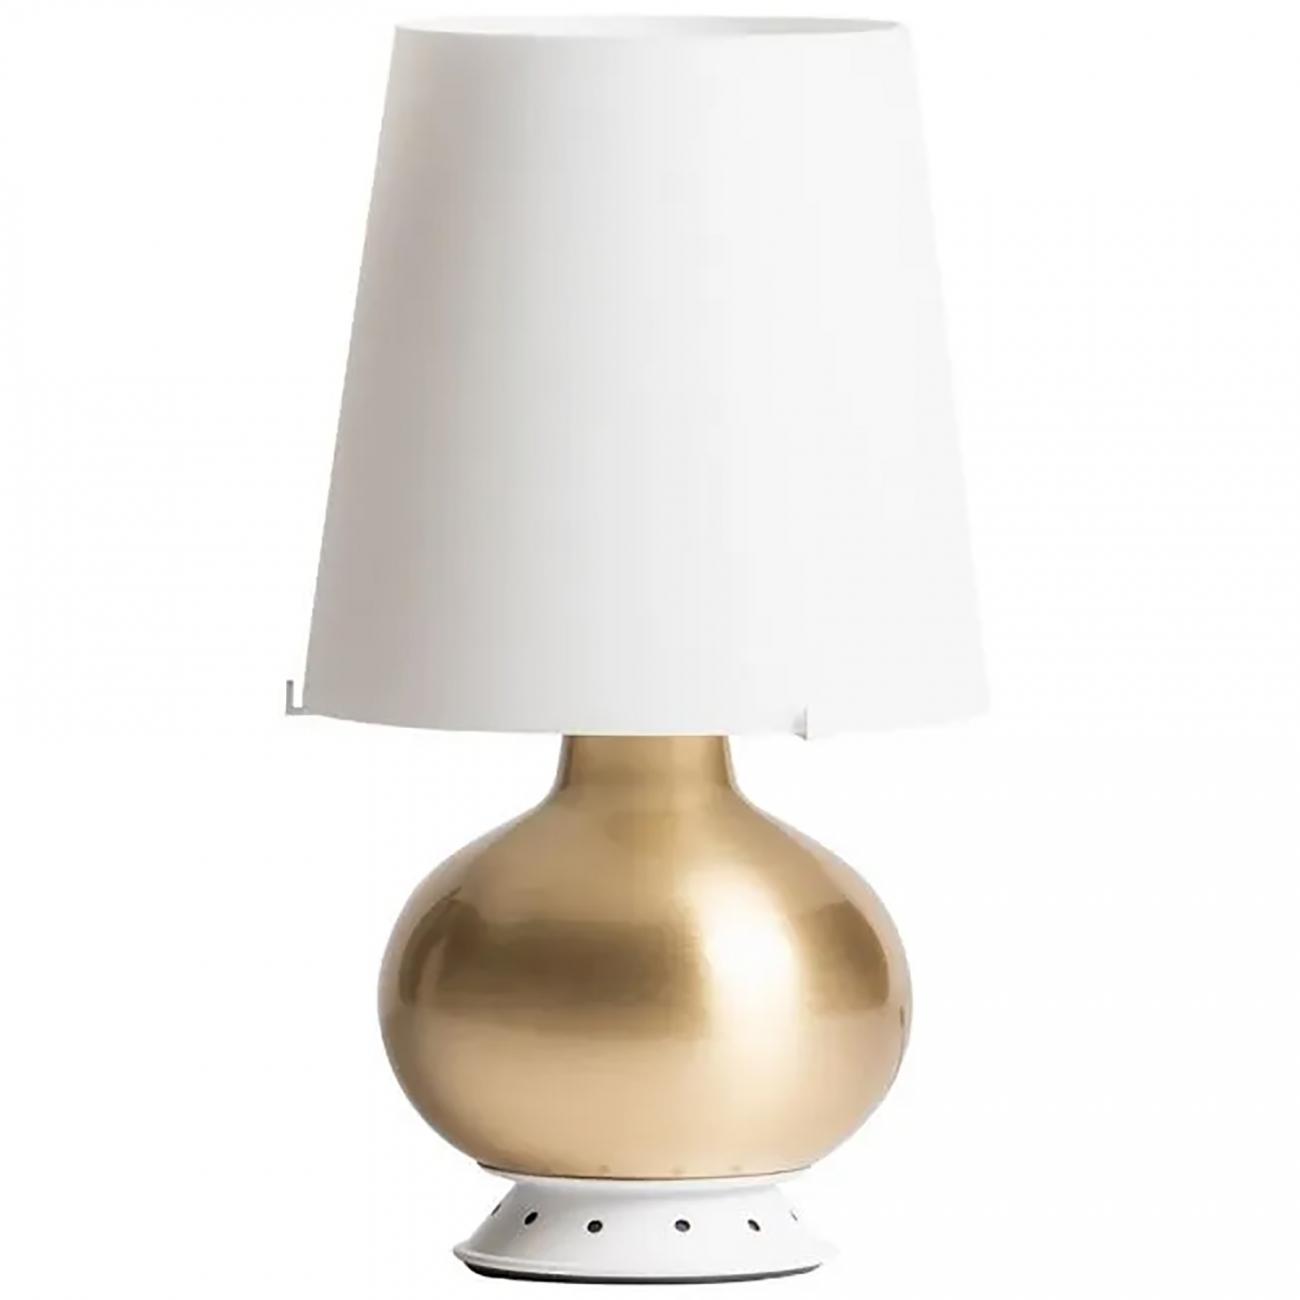 FontanaArte FONTANA lampada da tavolo media